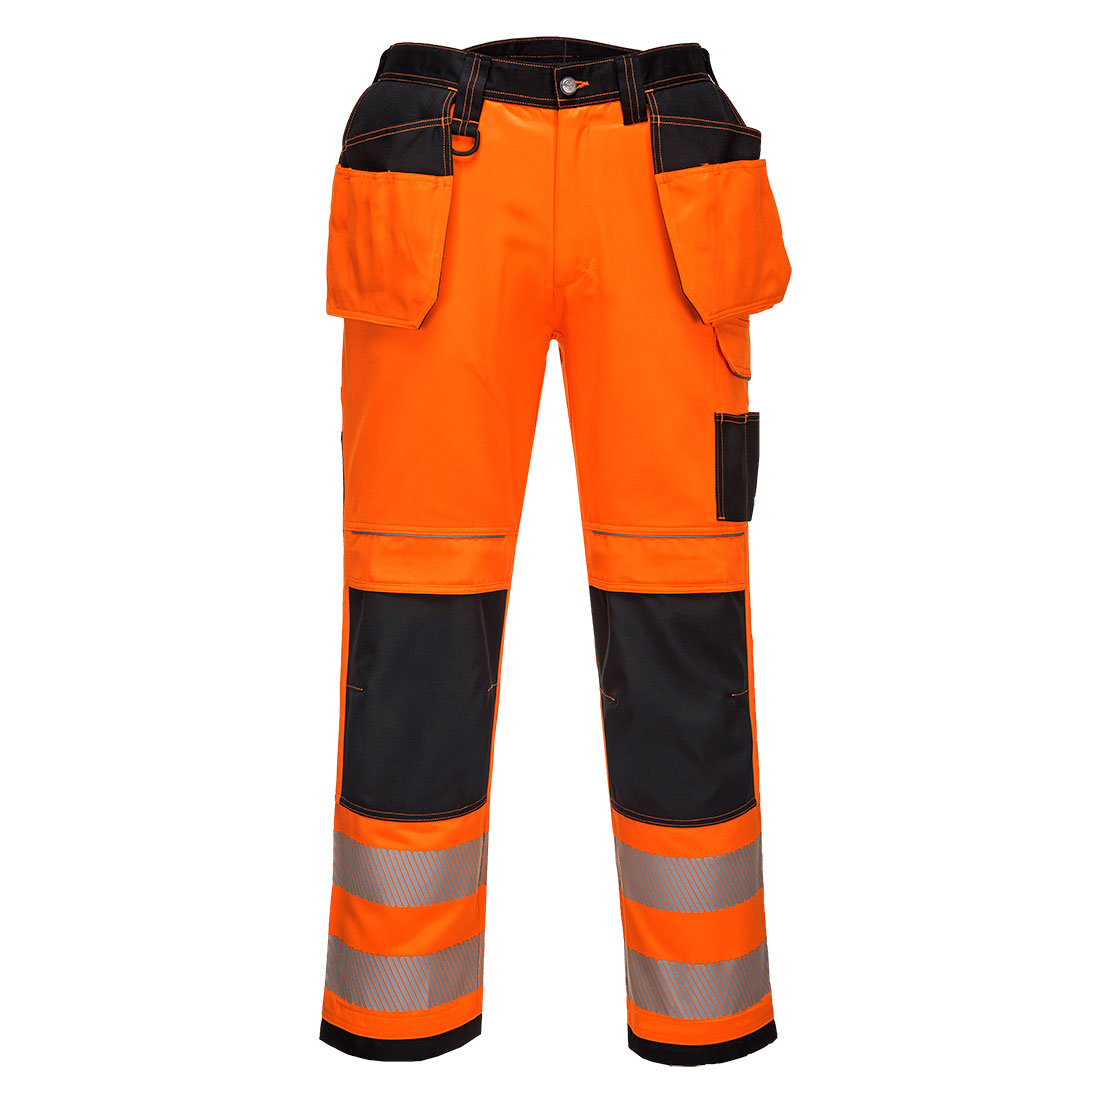 PW3 Hi-Vis Holster Trousers Orange/Black 46R